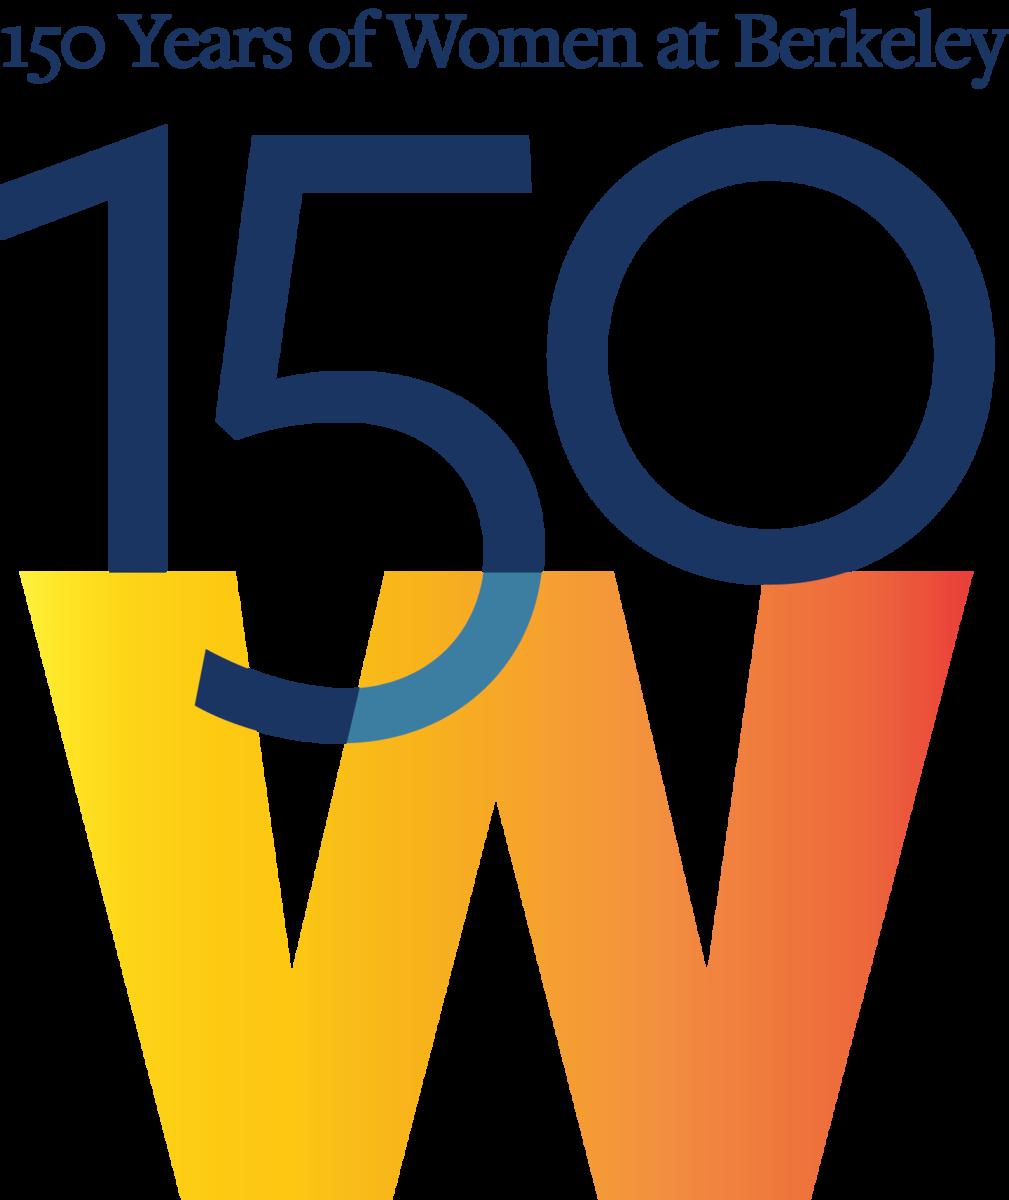 Translucent 150W logo